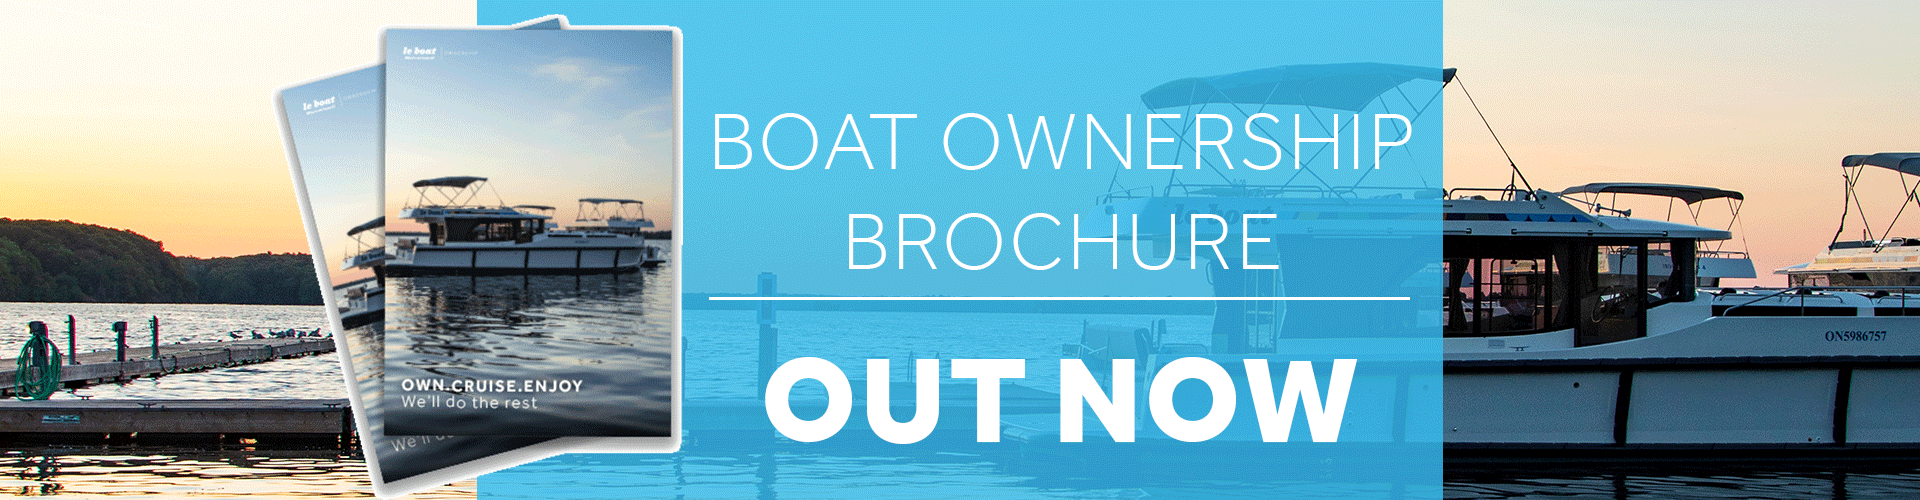 Le Boat - Boat Ownership Brochure